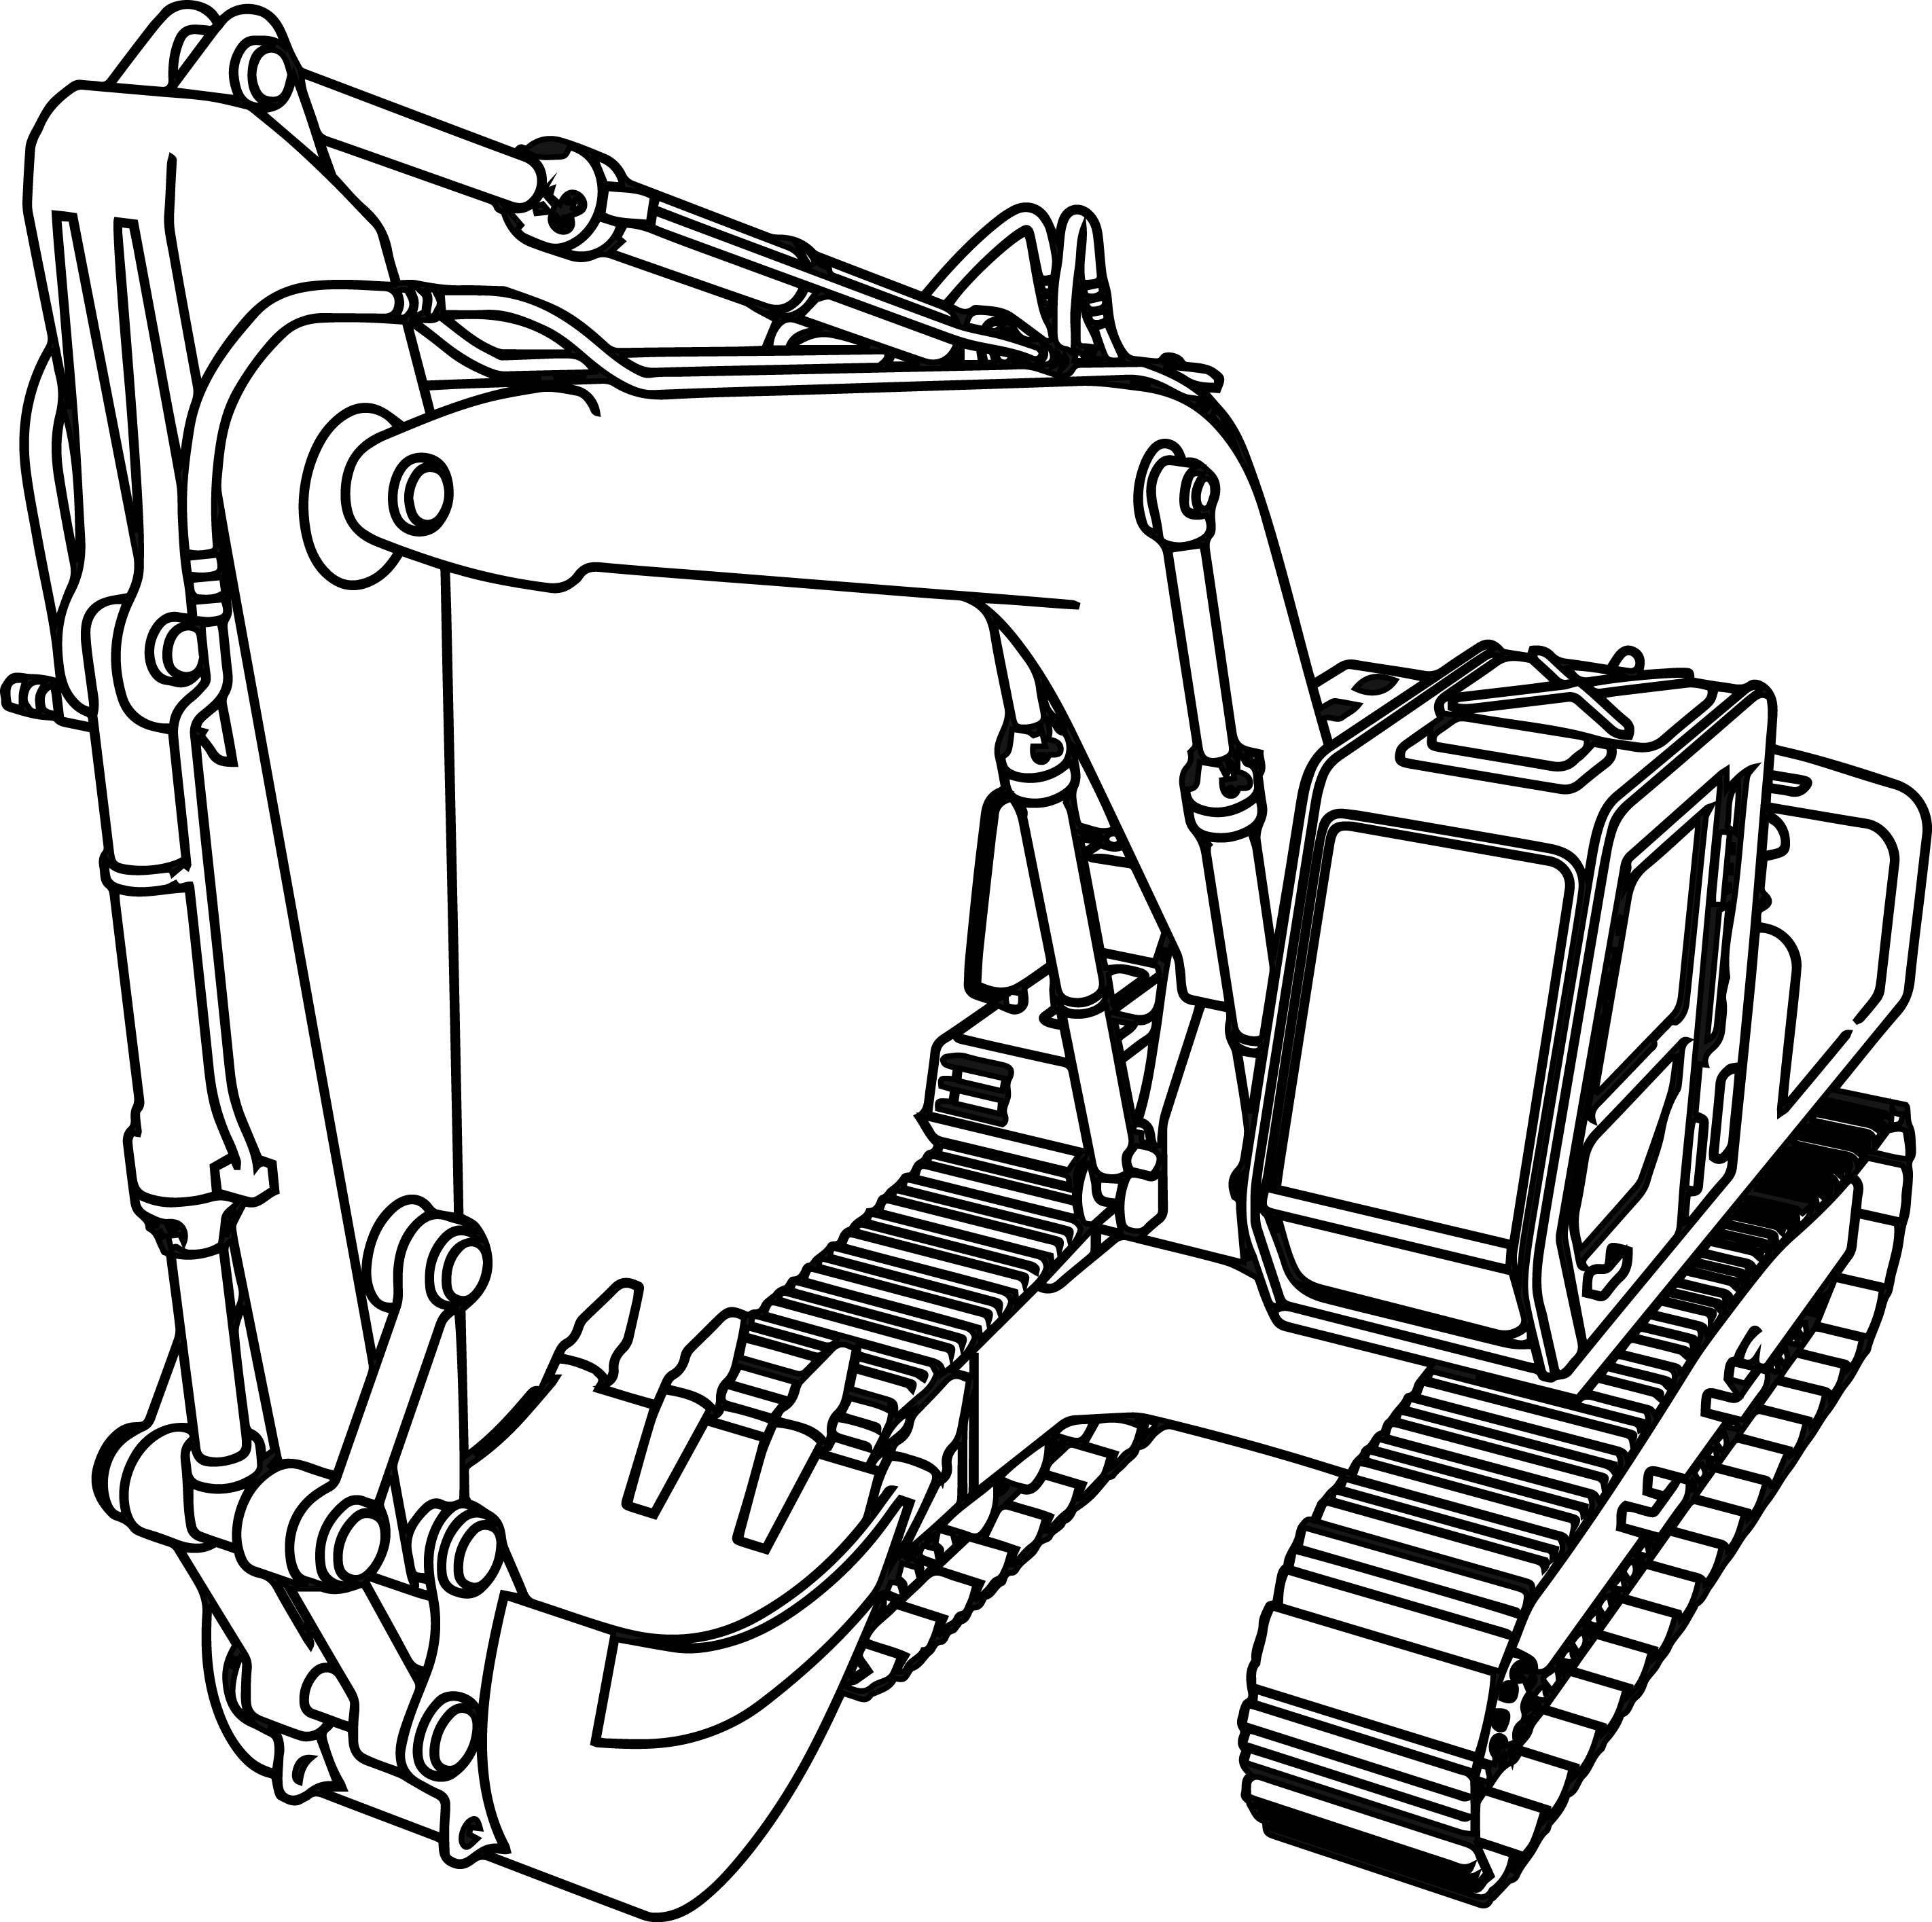 excavator drawing at getdrawings | free download